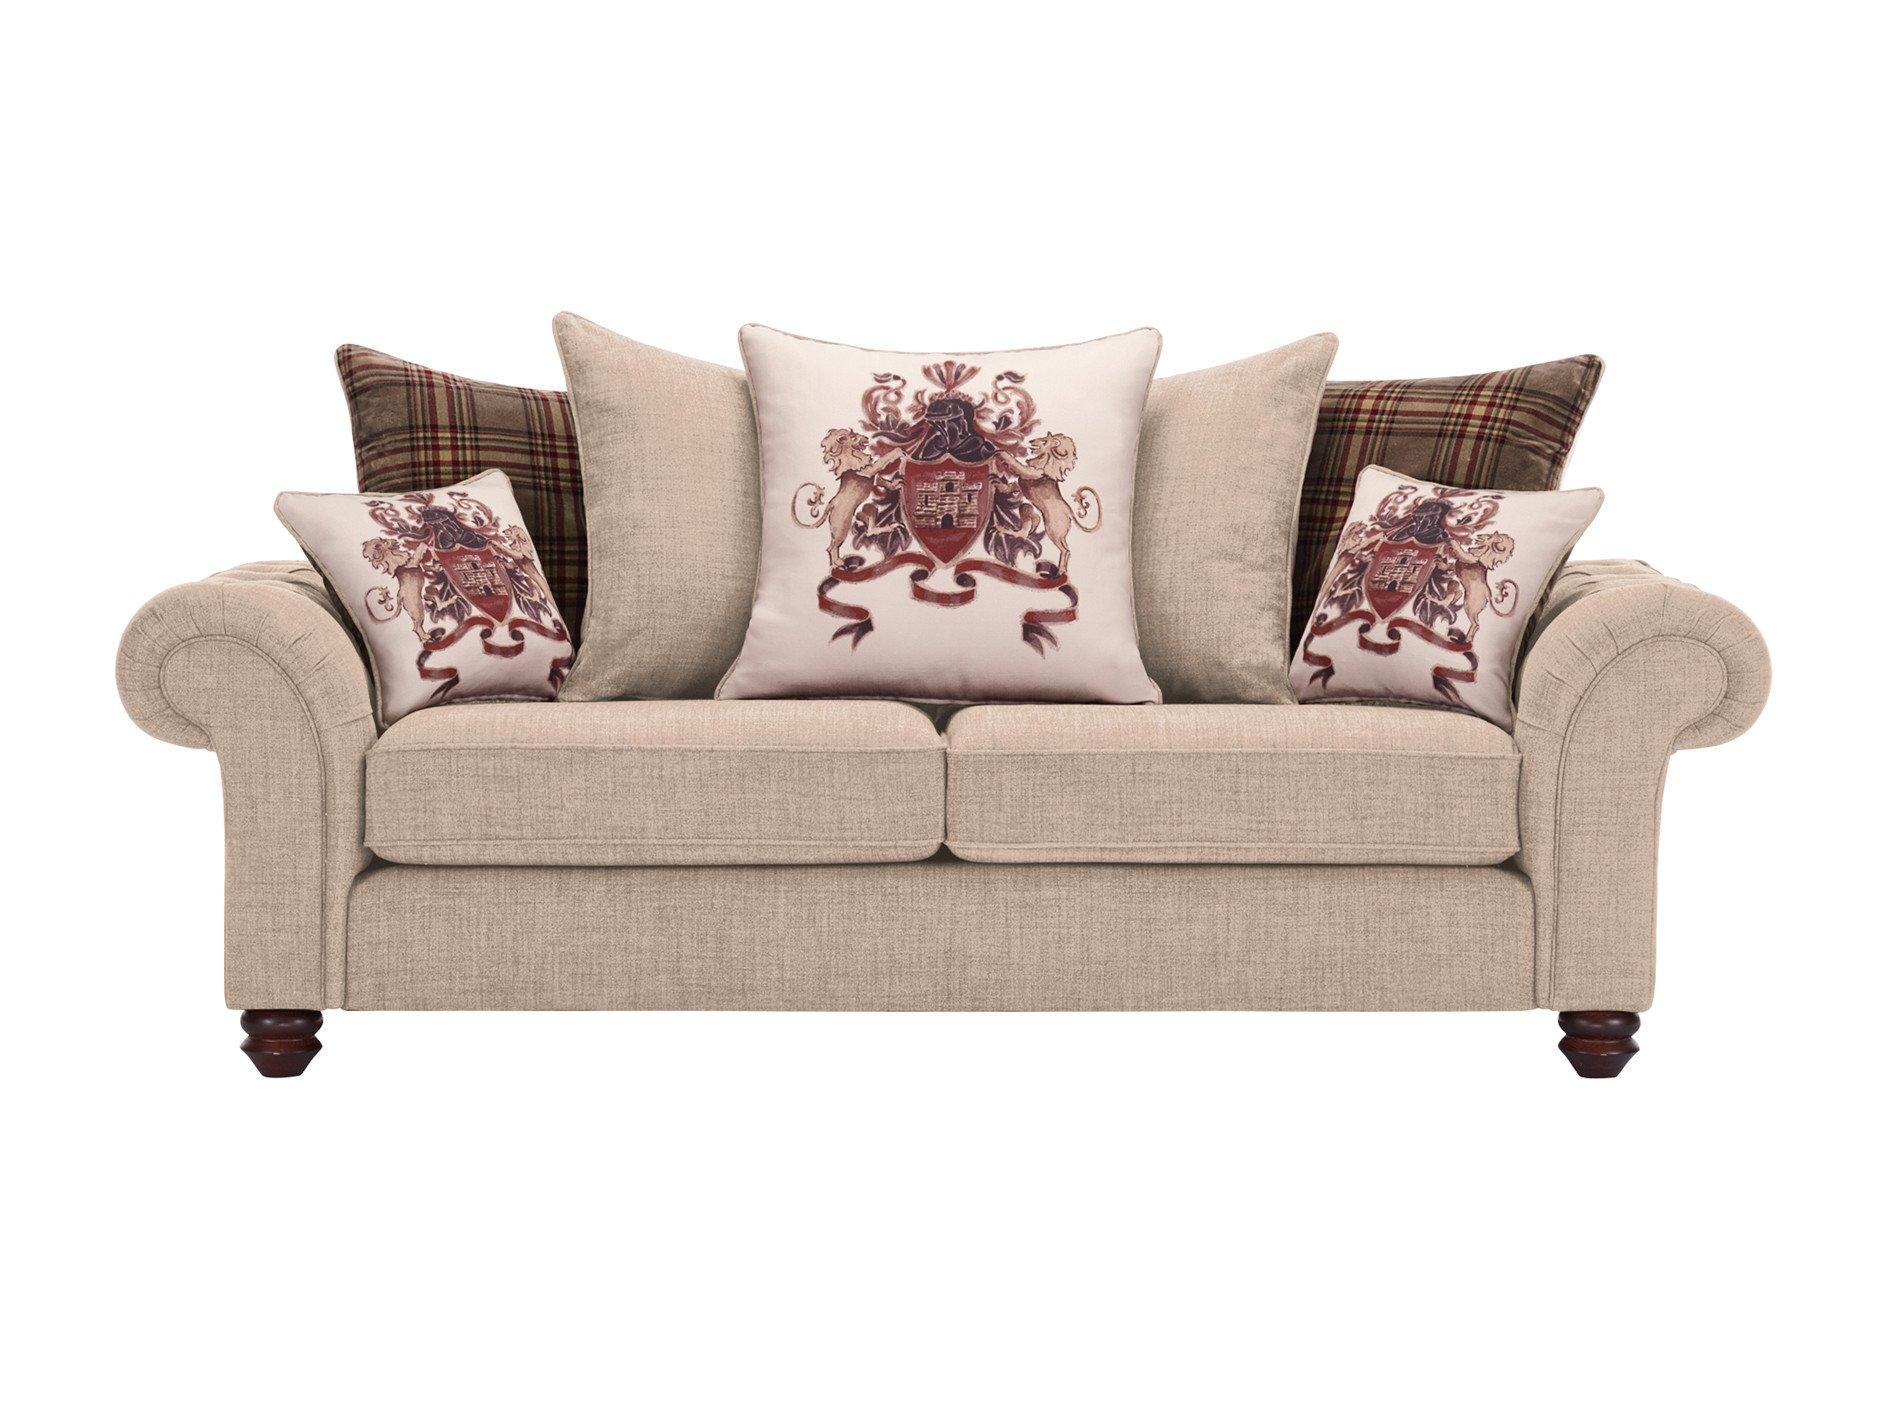 sandringham 3 seater pillow back sofa in beige with beige. Black Bedroom Furniture Sets. Home Design Ideas